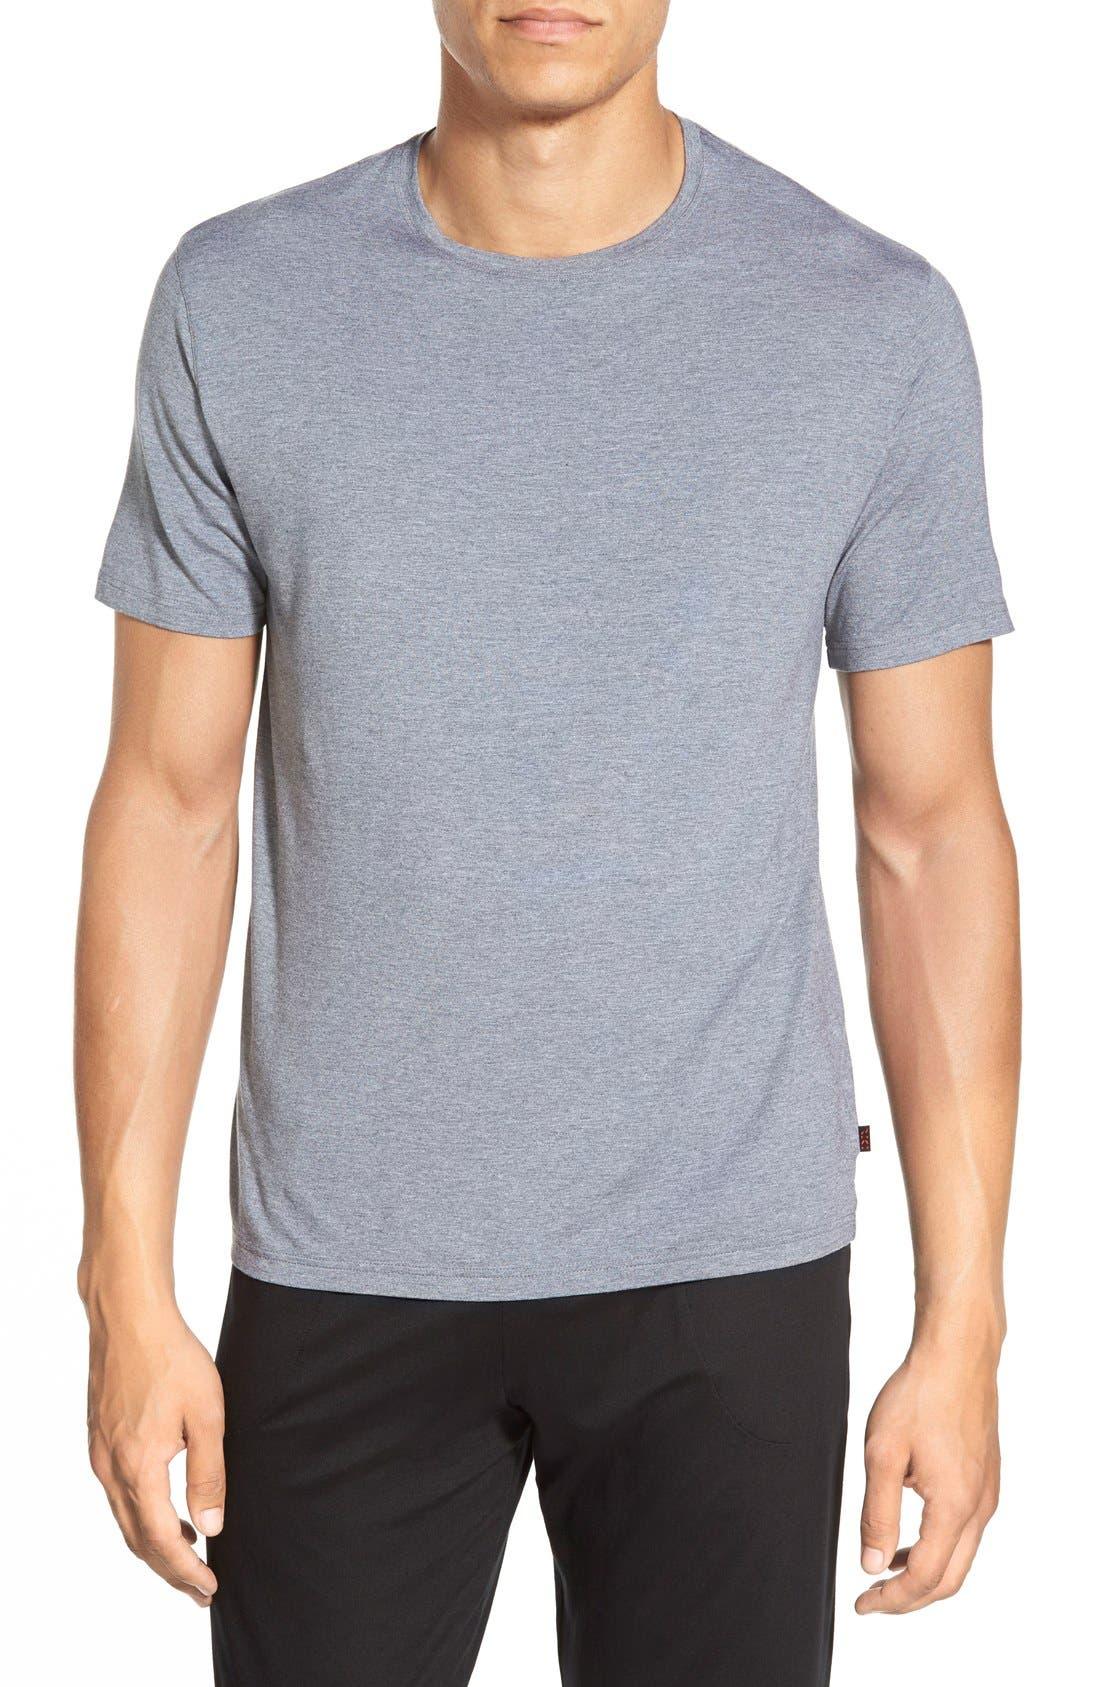 Main Image - Derek Rose 'Marlowe' Stretch Modal T-Shirt